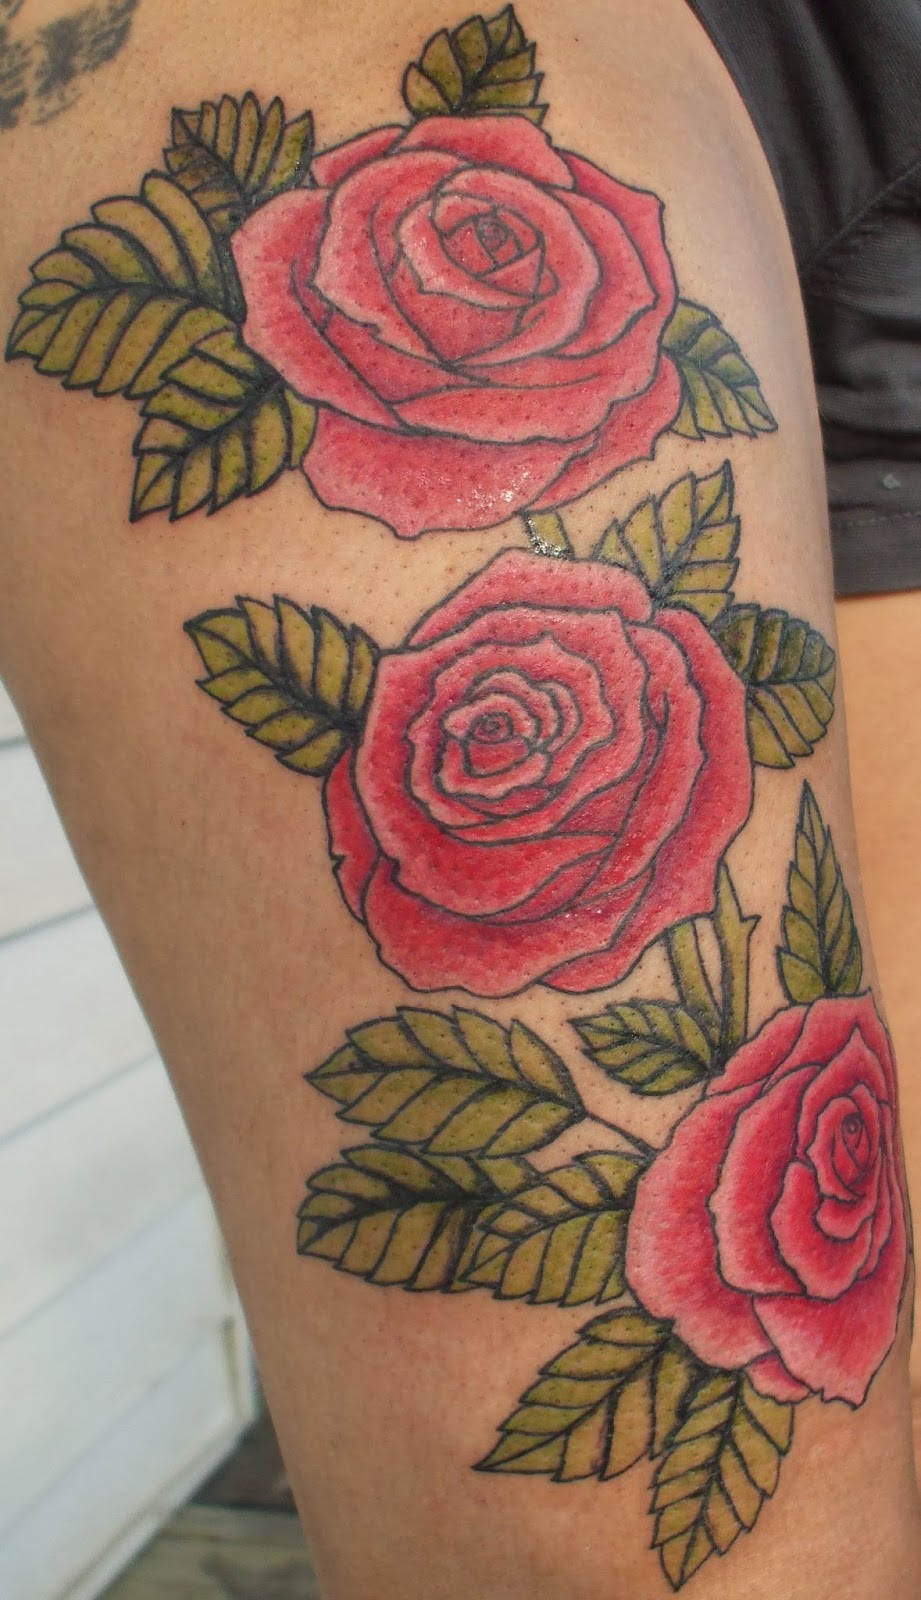 Carole duchesneau artiste tatouage fleurs papillons - Fleur tatouage dessin ...